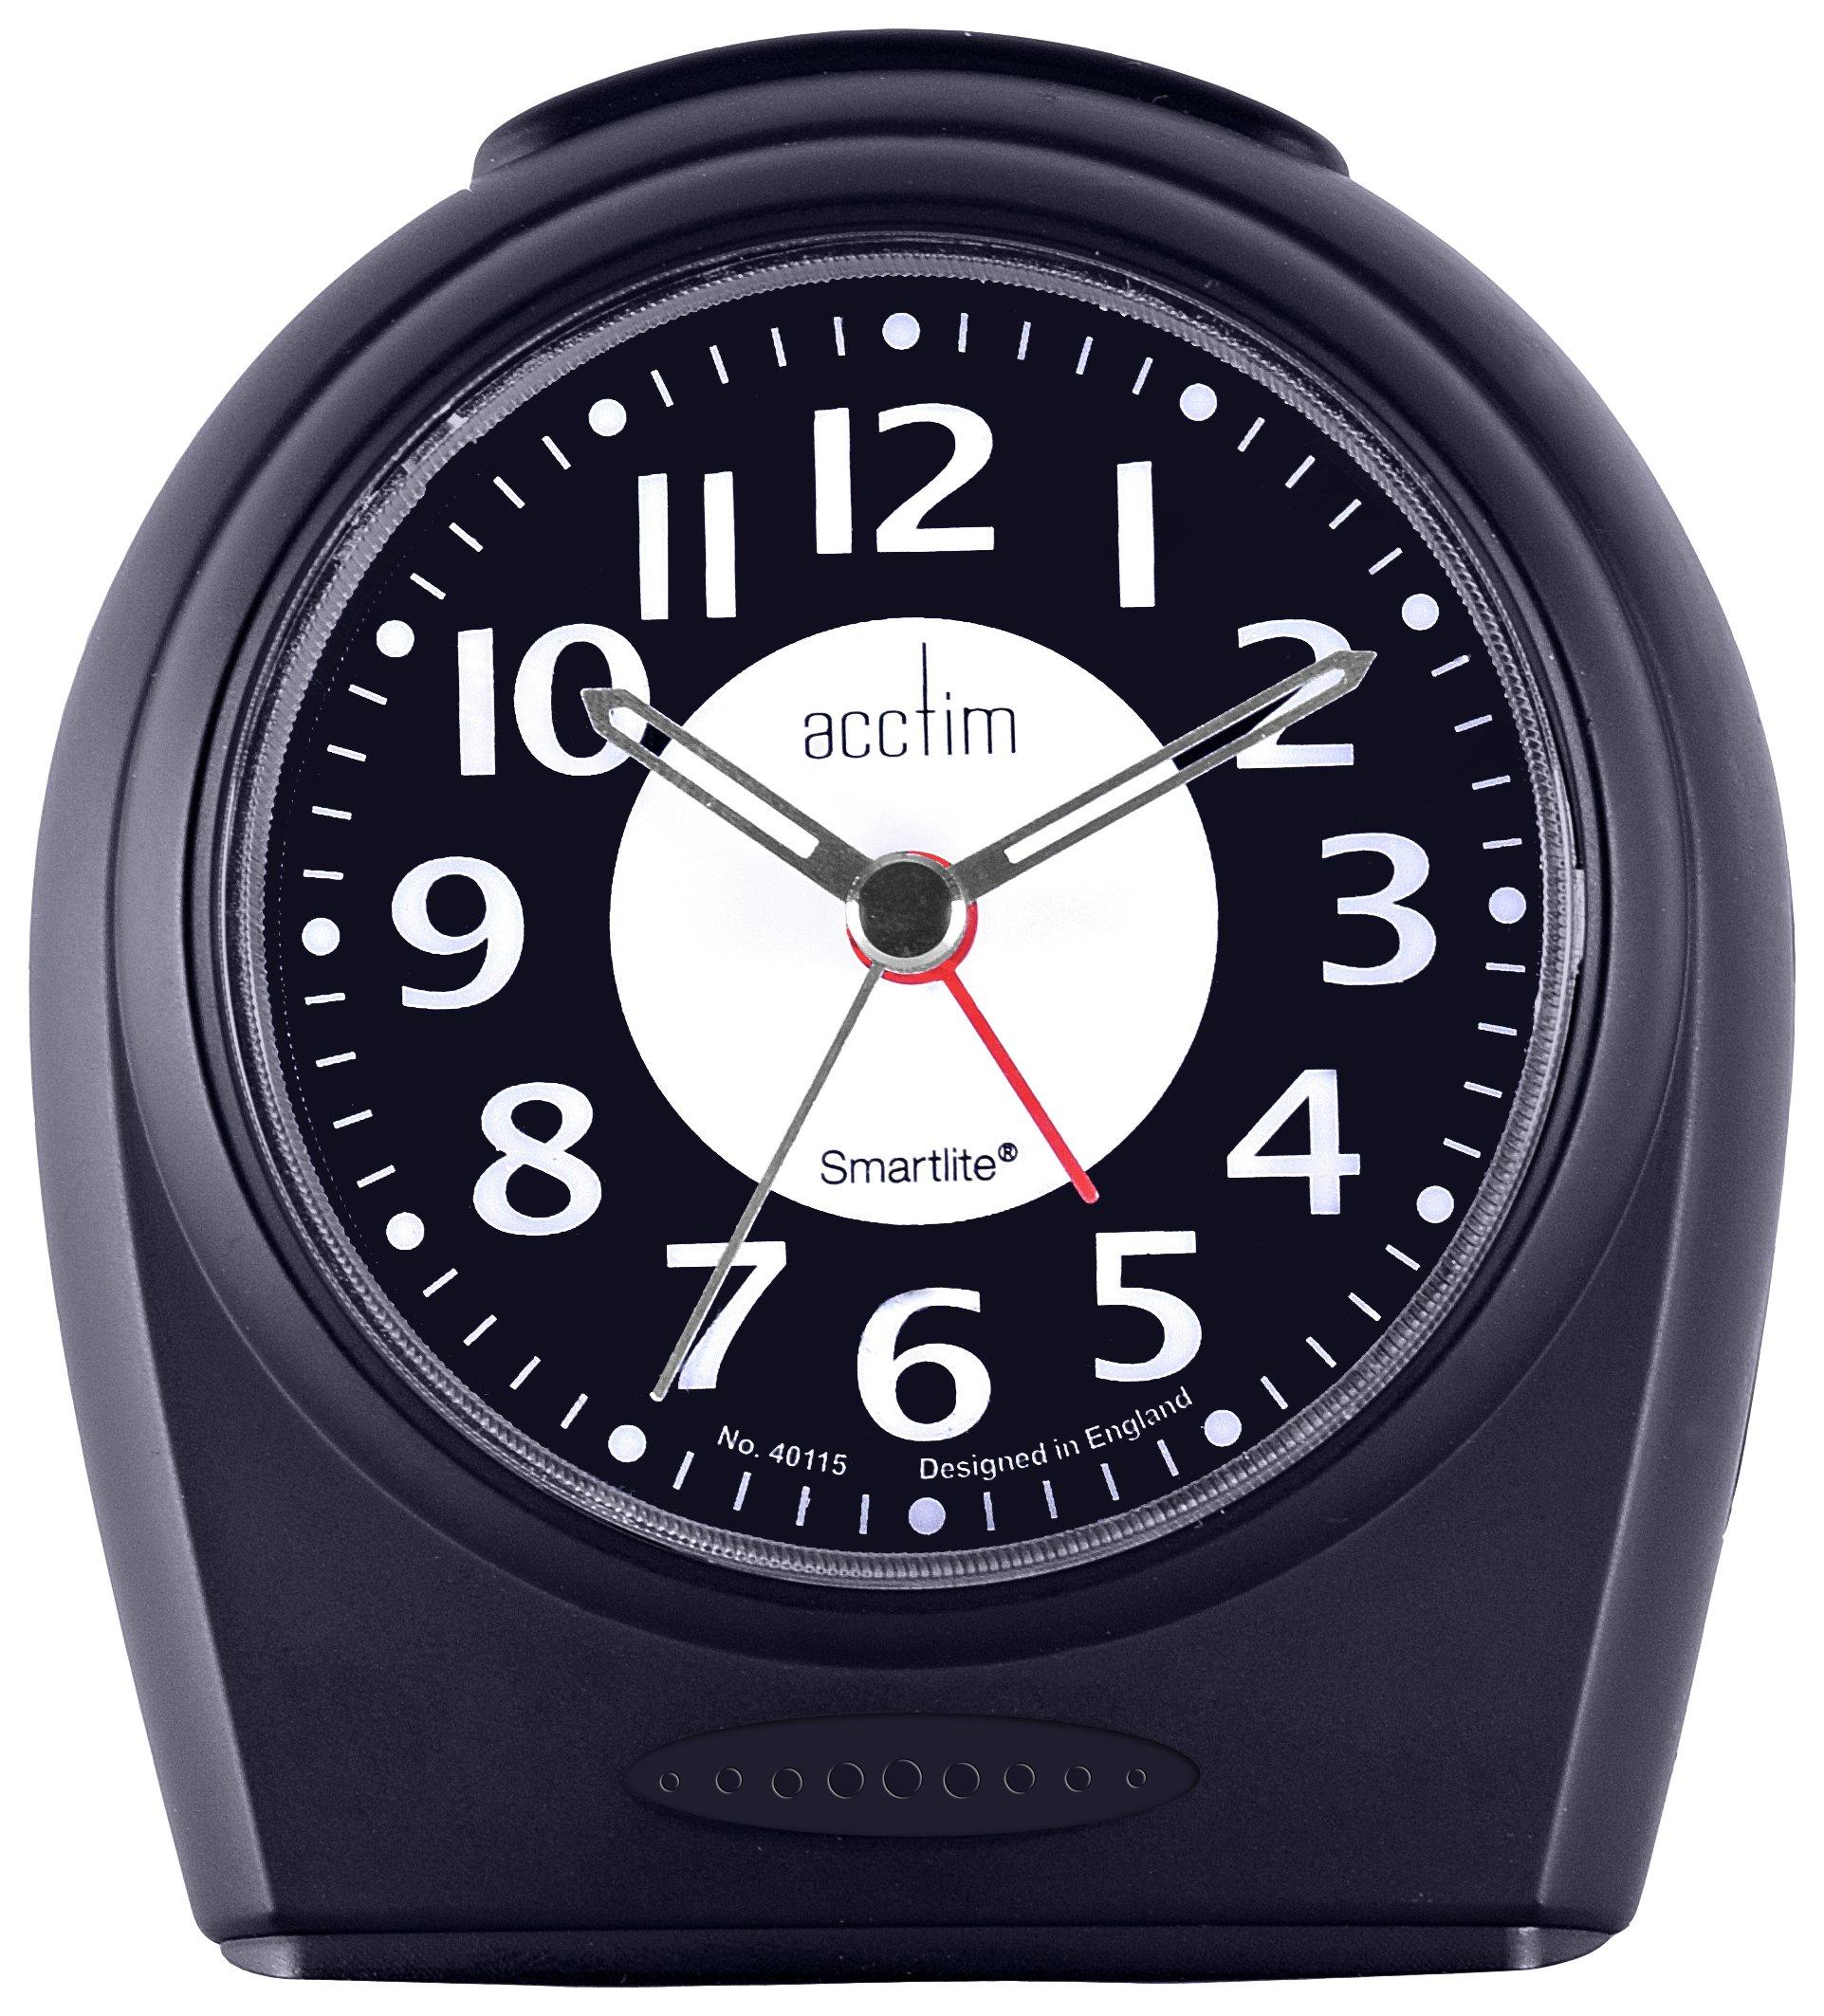 Image of Acctim Broadway Smartlite Alarm Clock